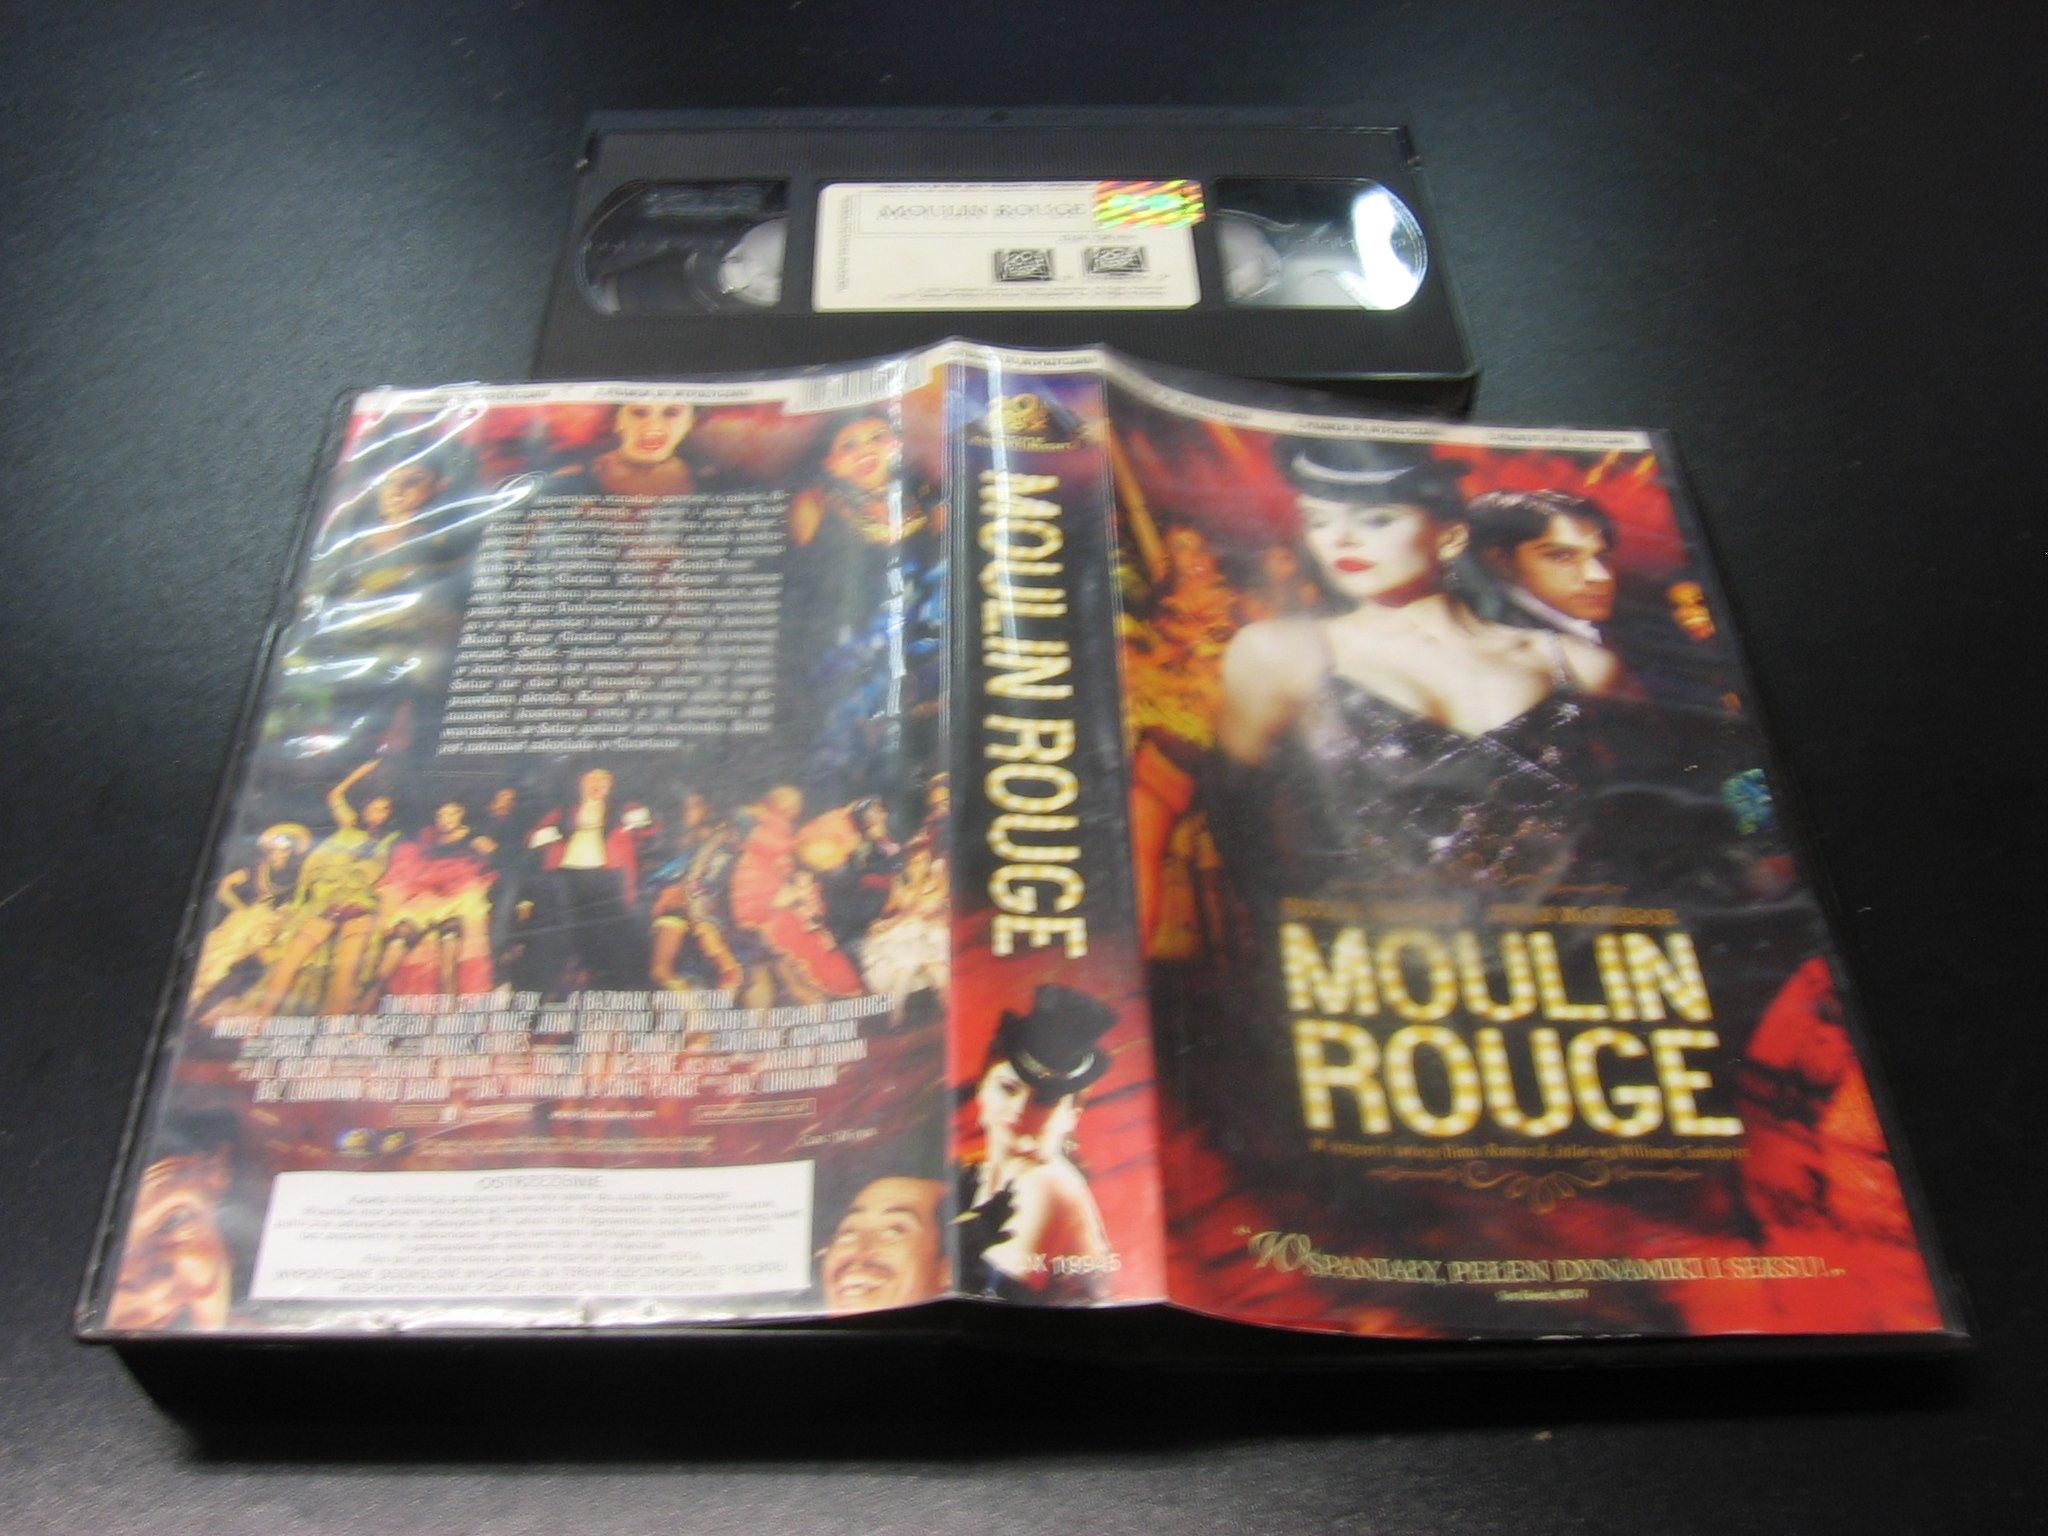 MOULIN ROUGE ```````````` VHS ```````````` Opole 0434